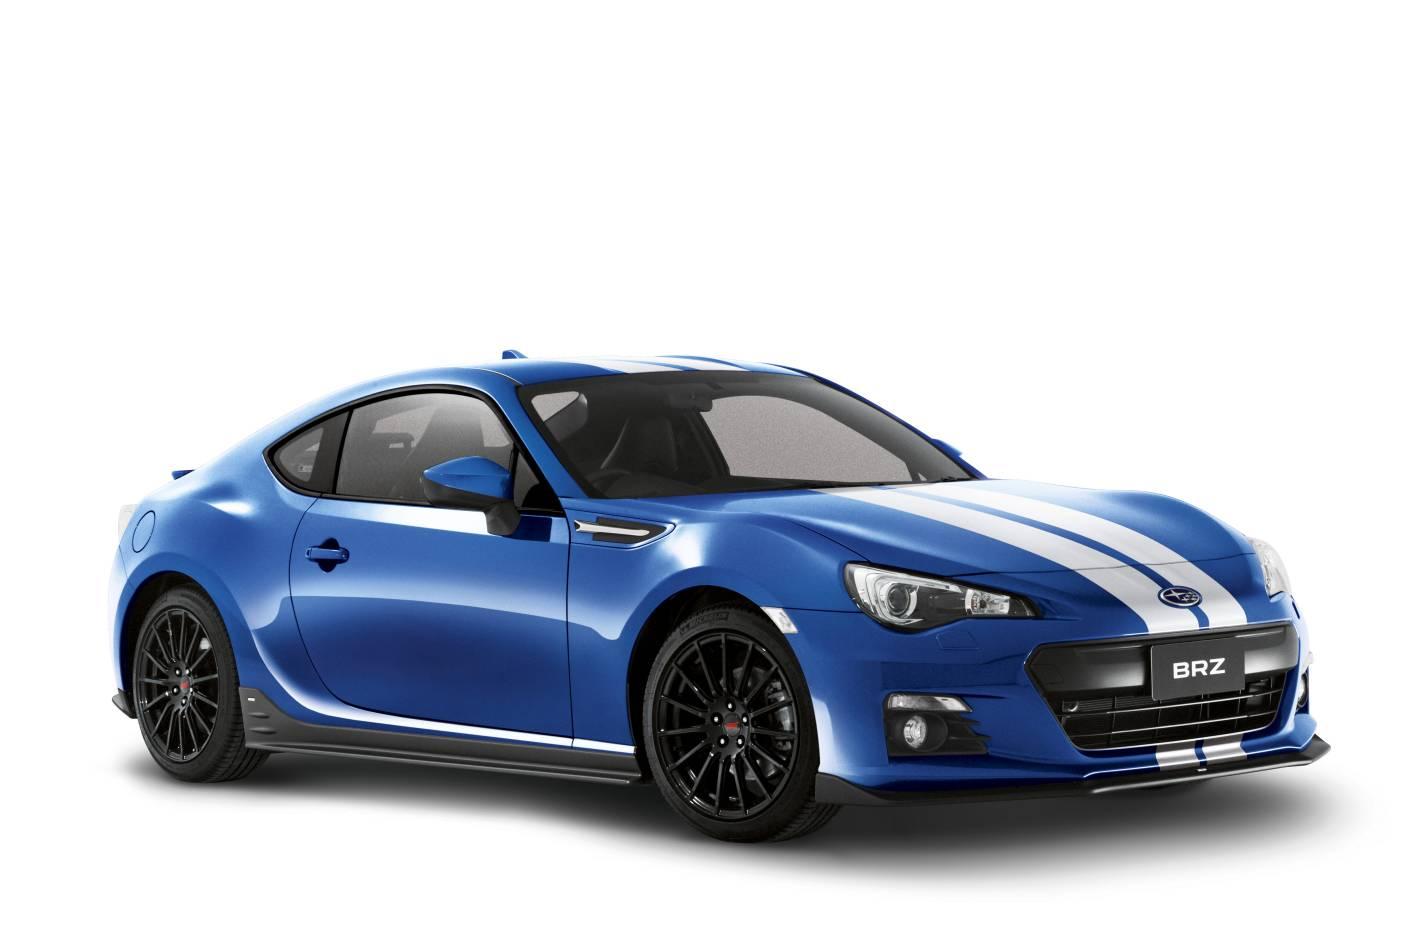 Brz Vs Wrx >> 2015 Subaru BRZ gets GT stripes - ForceGT.com